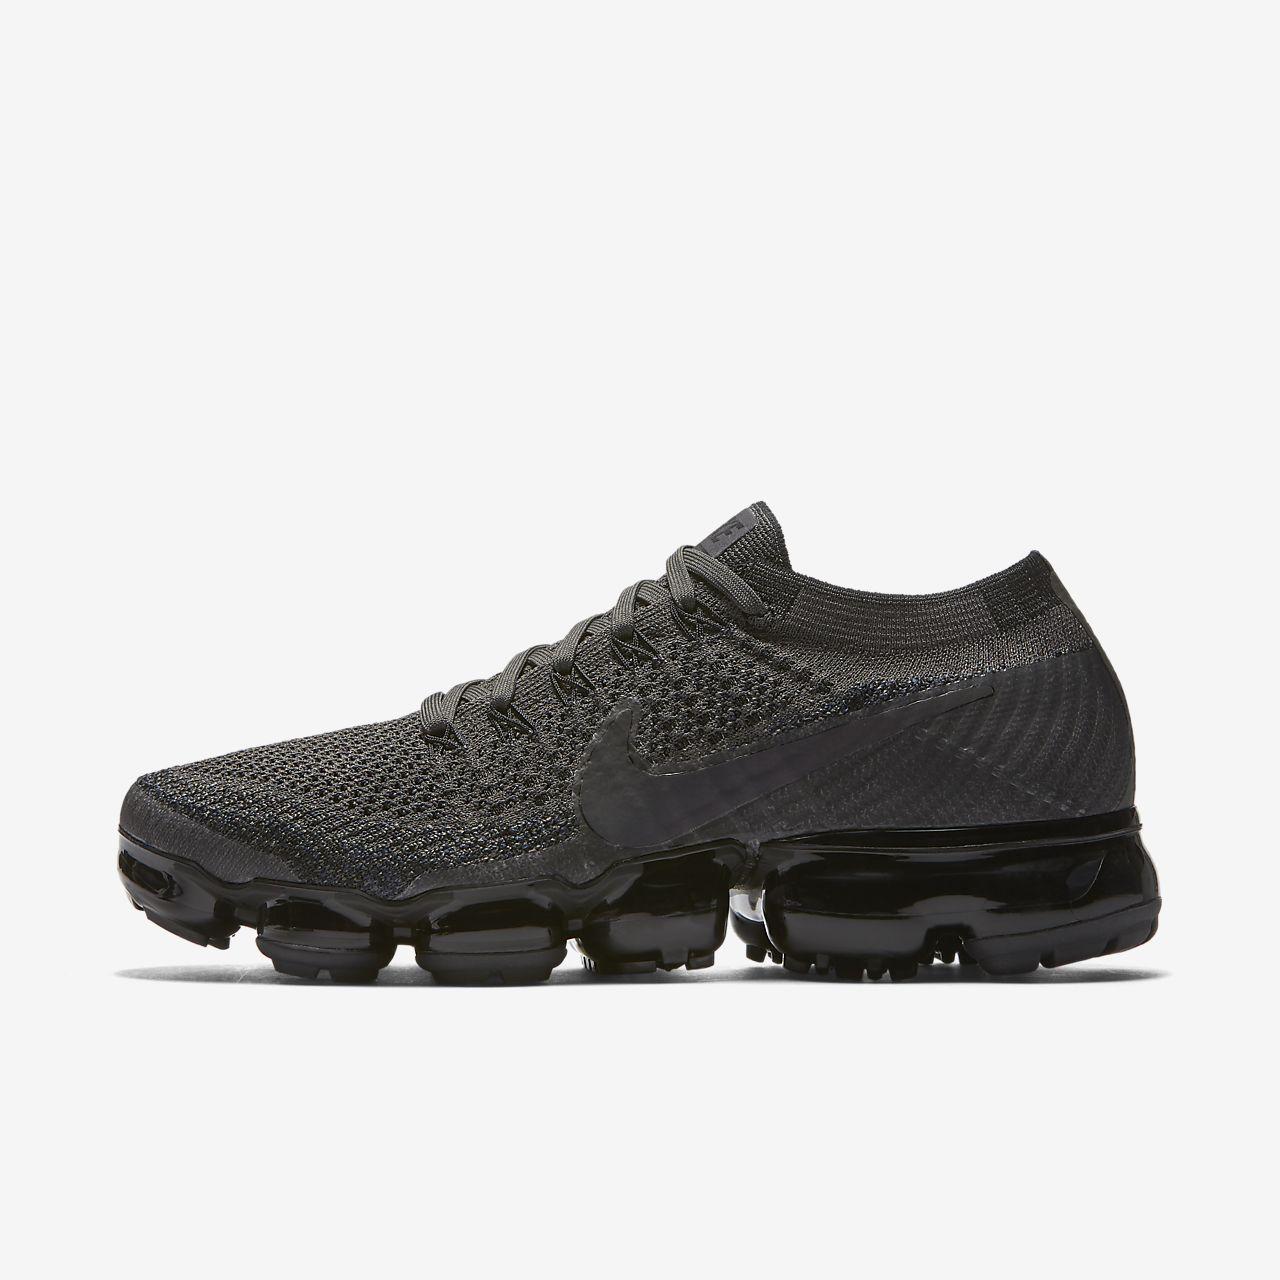 Nike Air Vapormax - Damen Schuhe Black Größe 36.5 AWsUsS